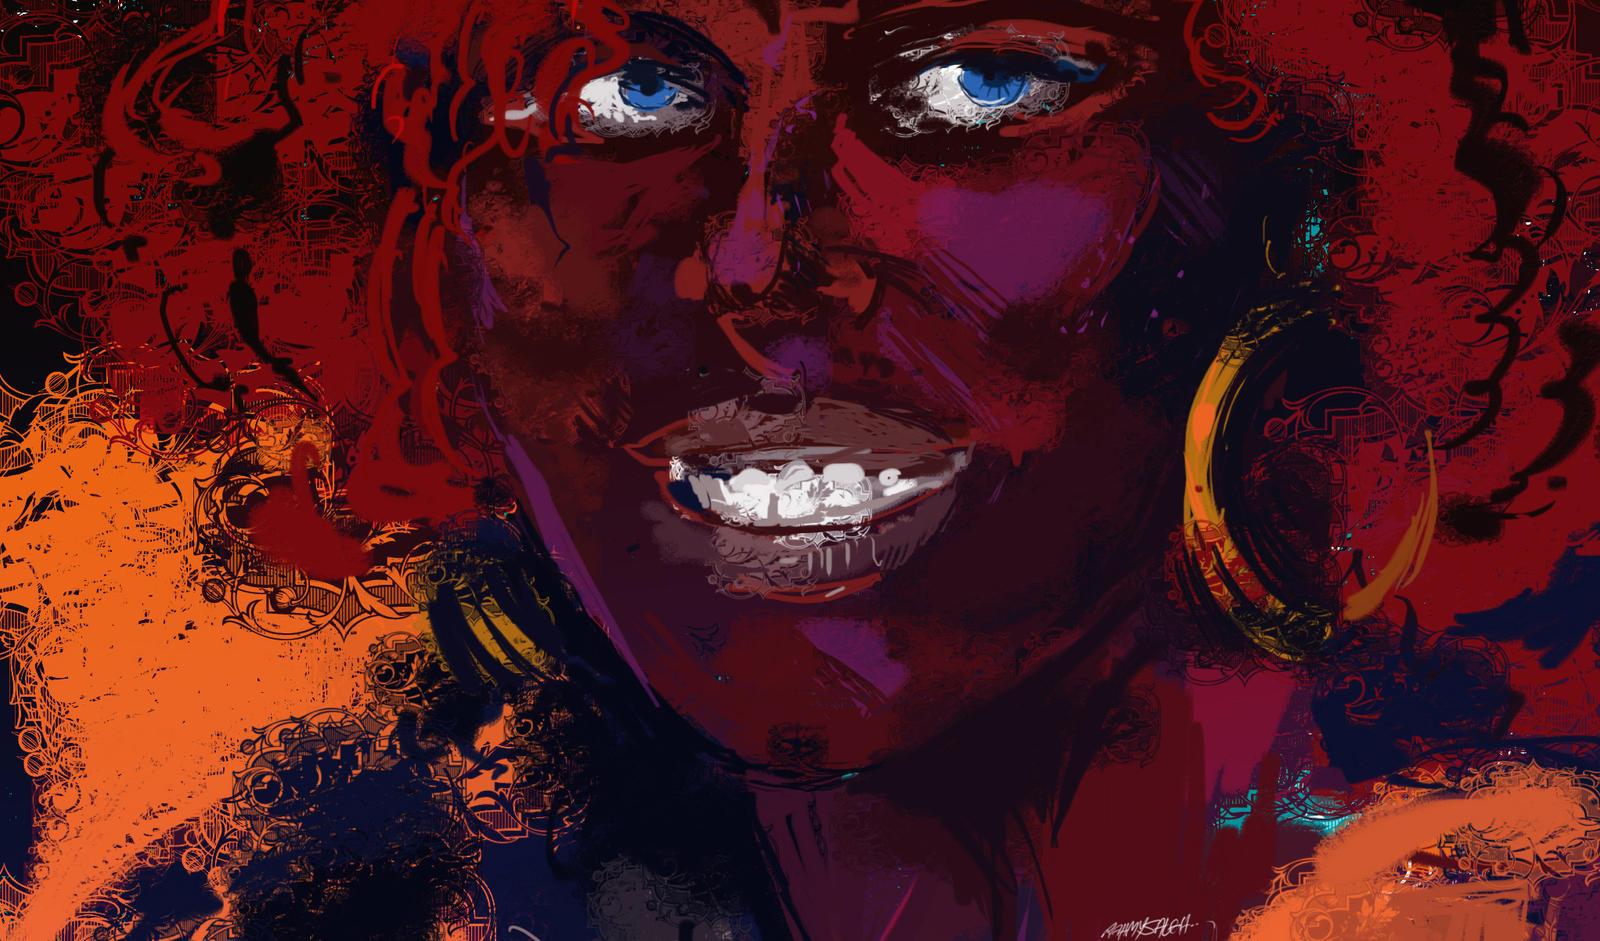 black girl by RahmySaleh